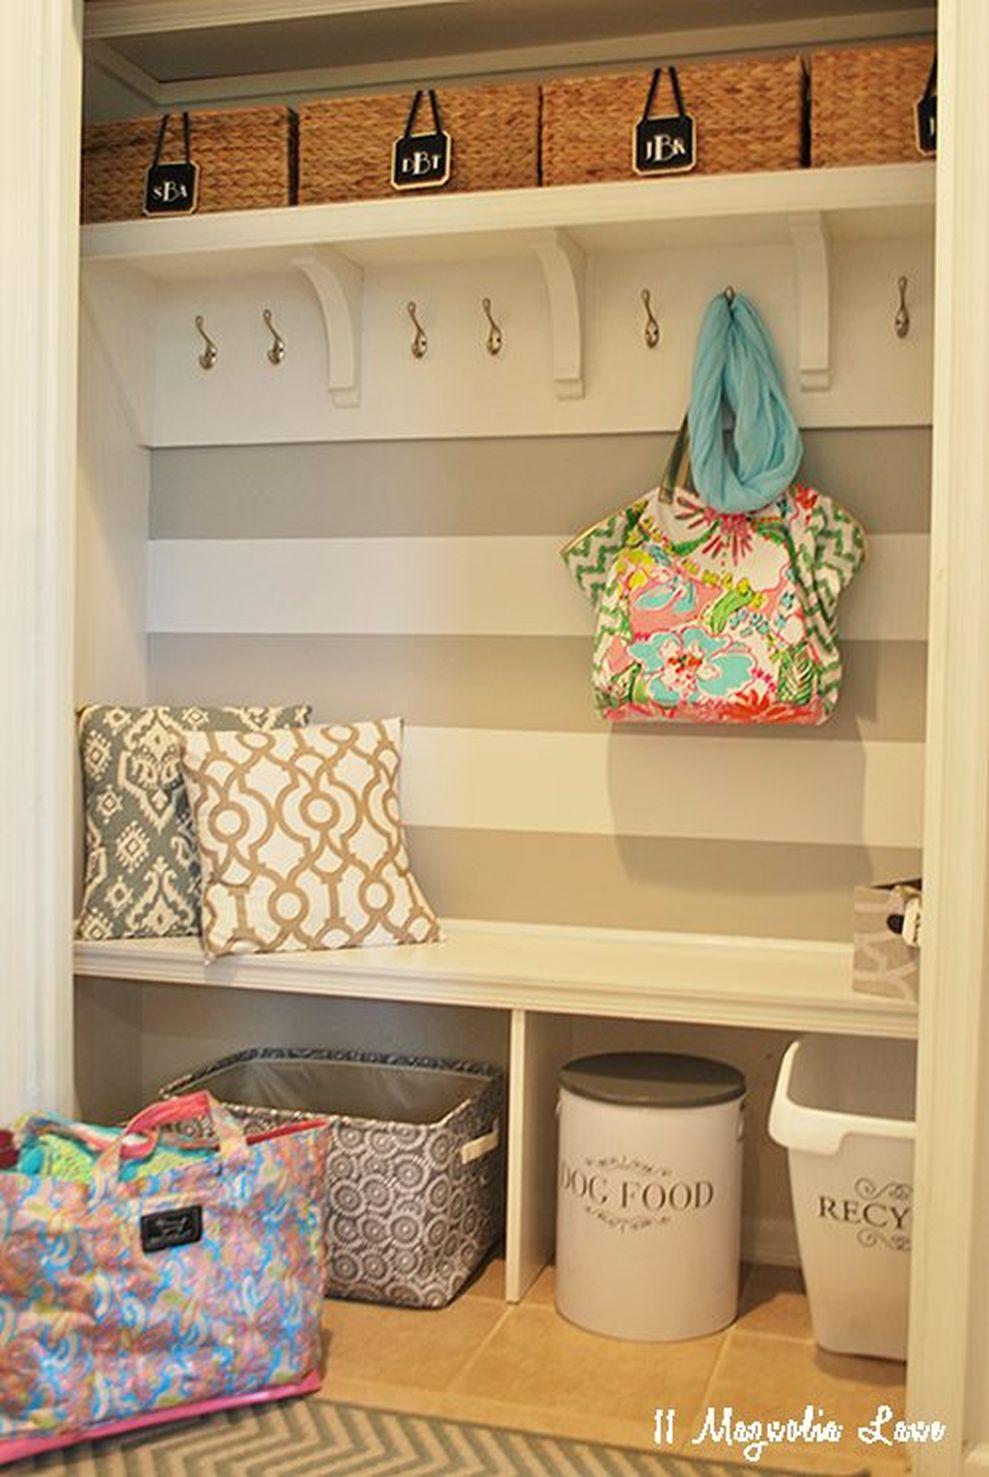 Easy and affordable diy wood closet shelves ideas 05 - Round Decor